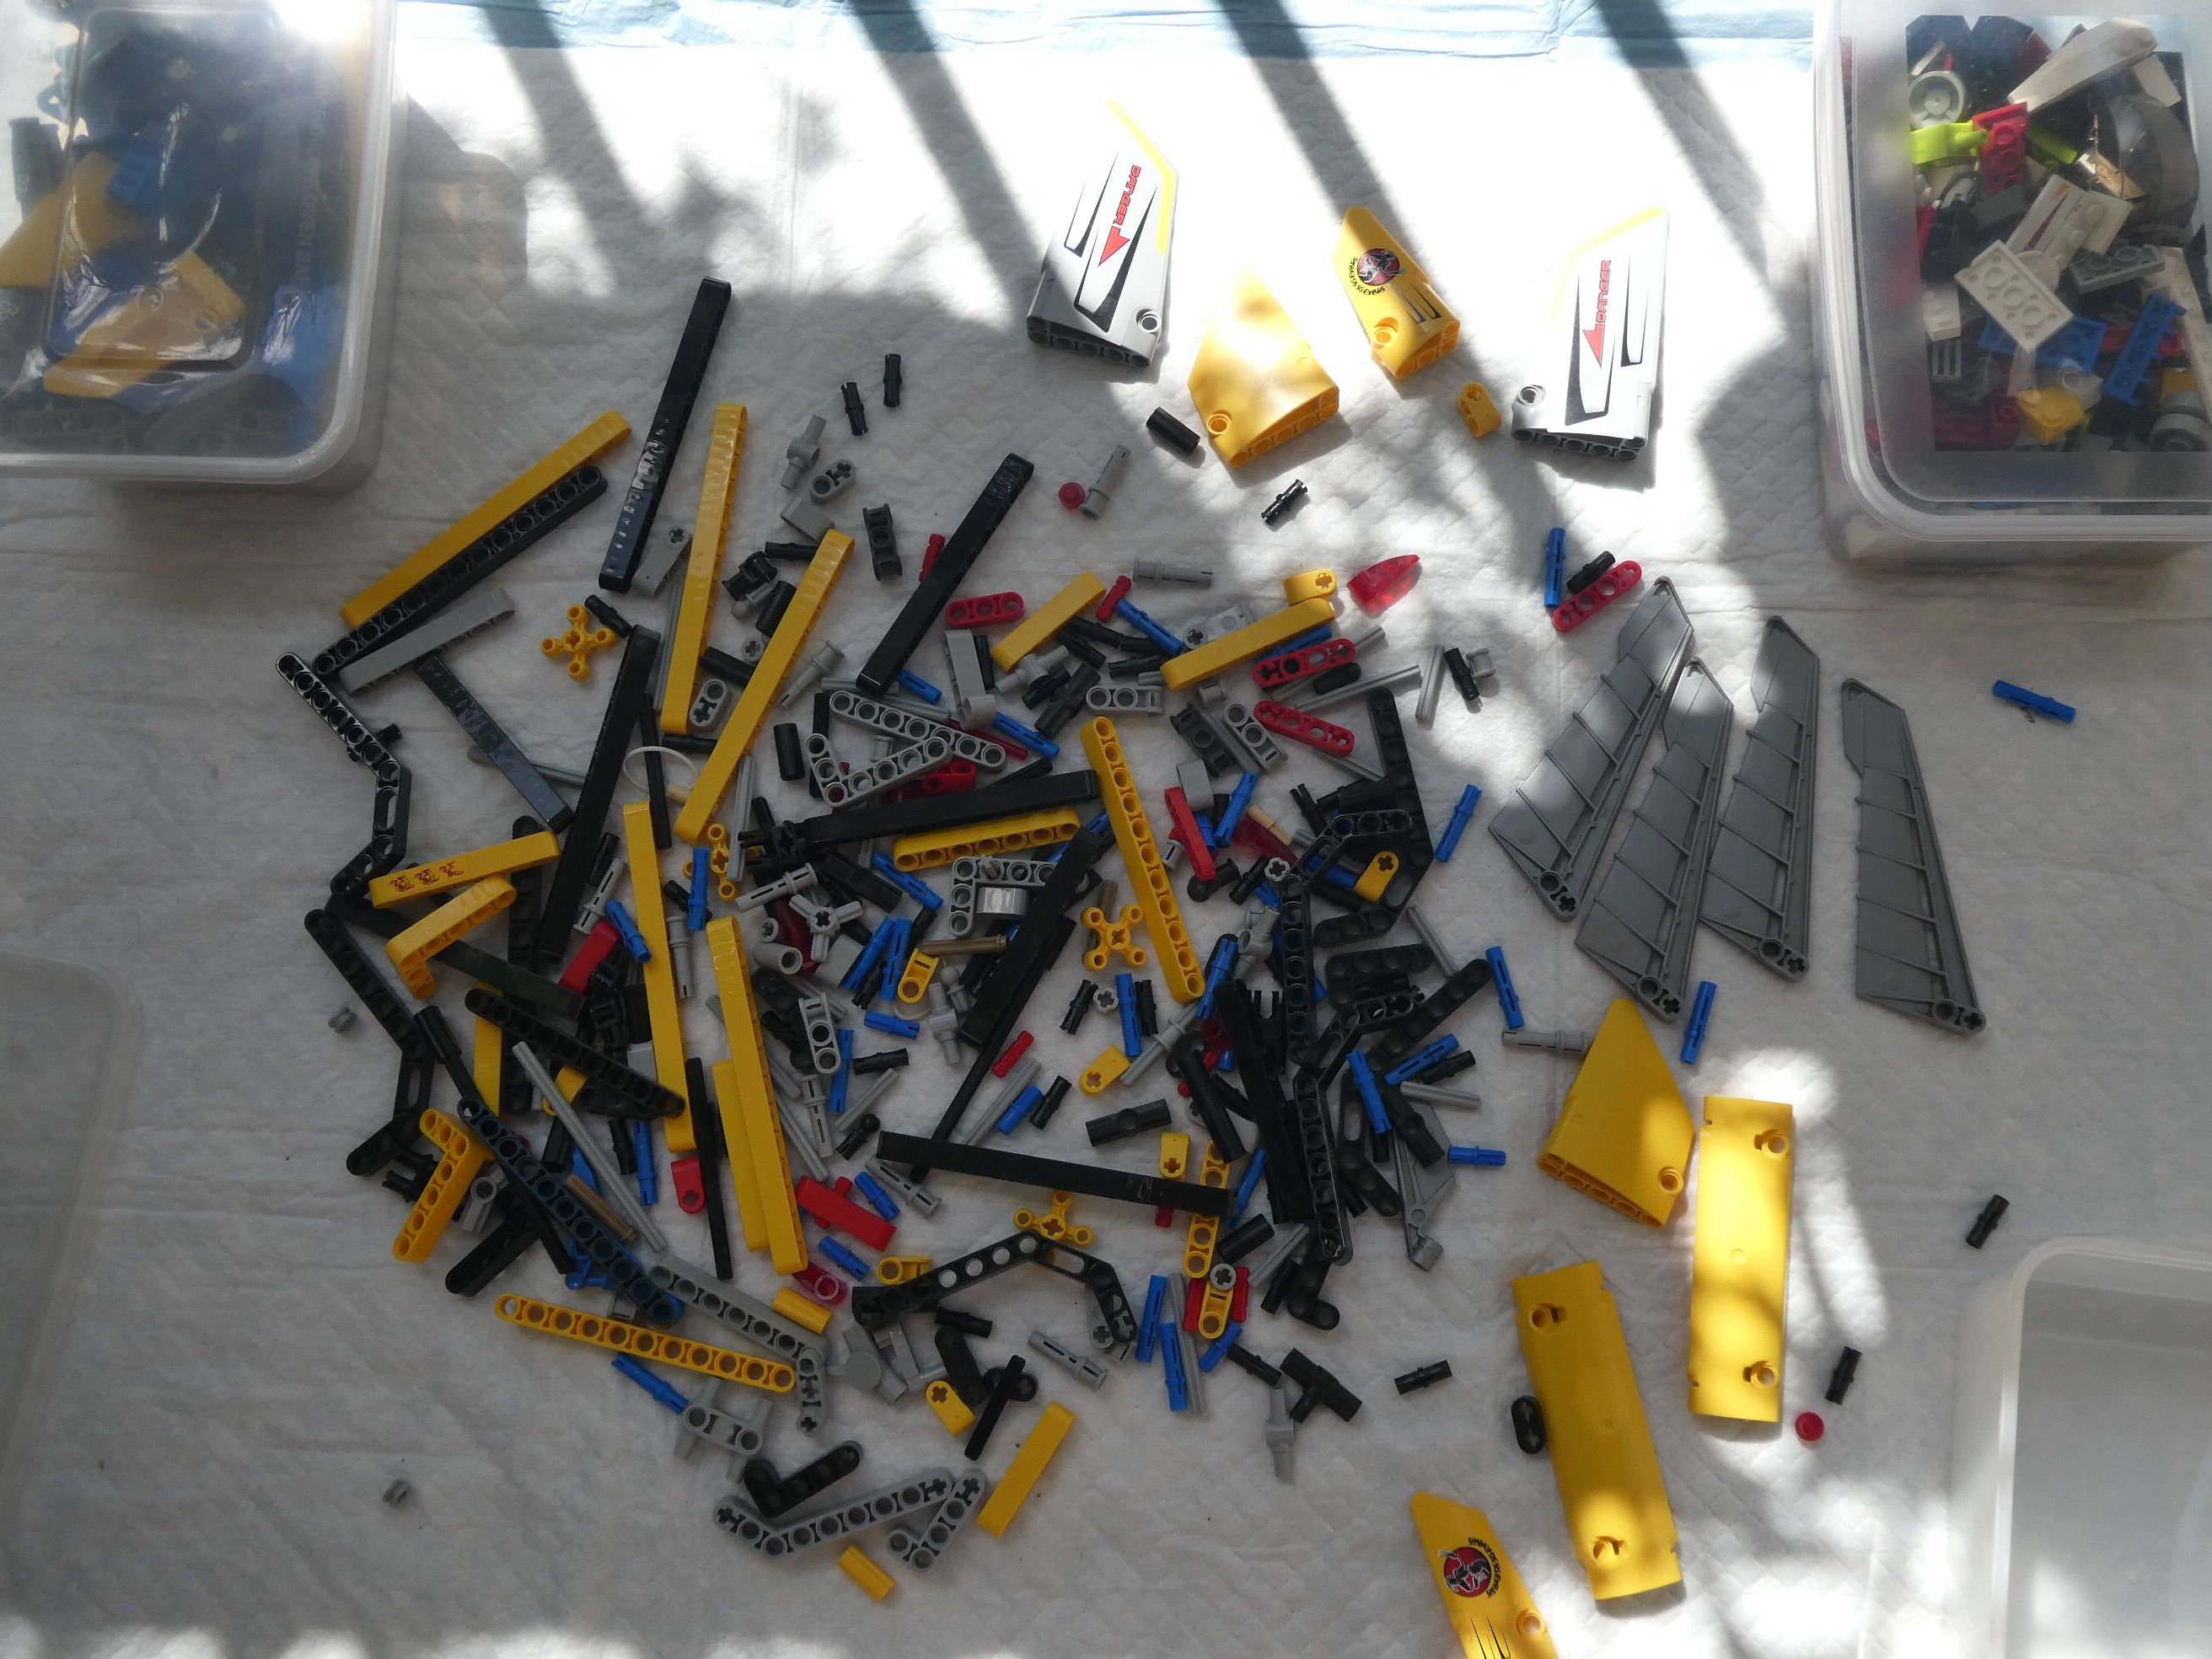 Pièces LEGO en vrac